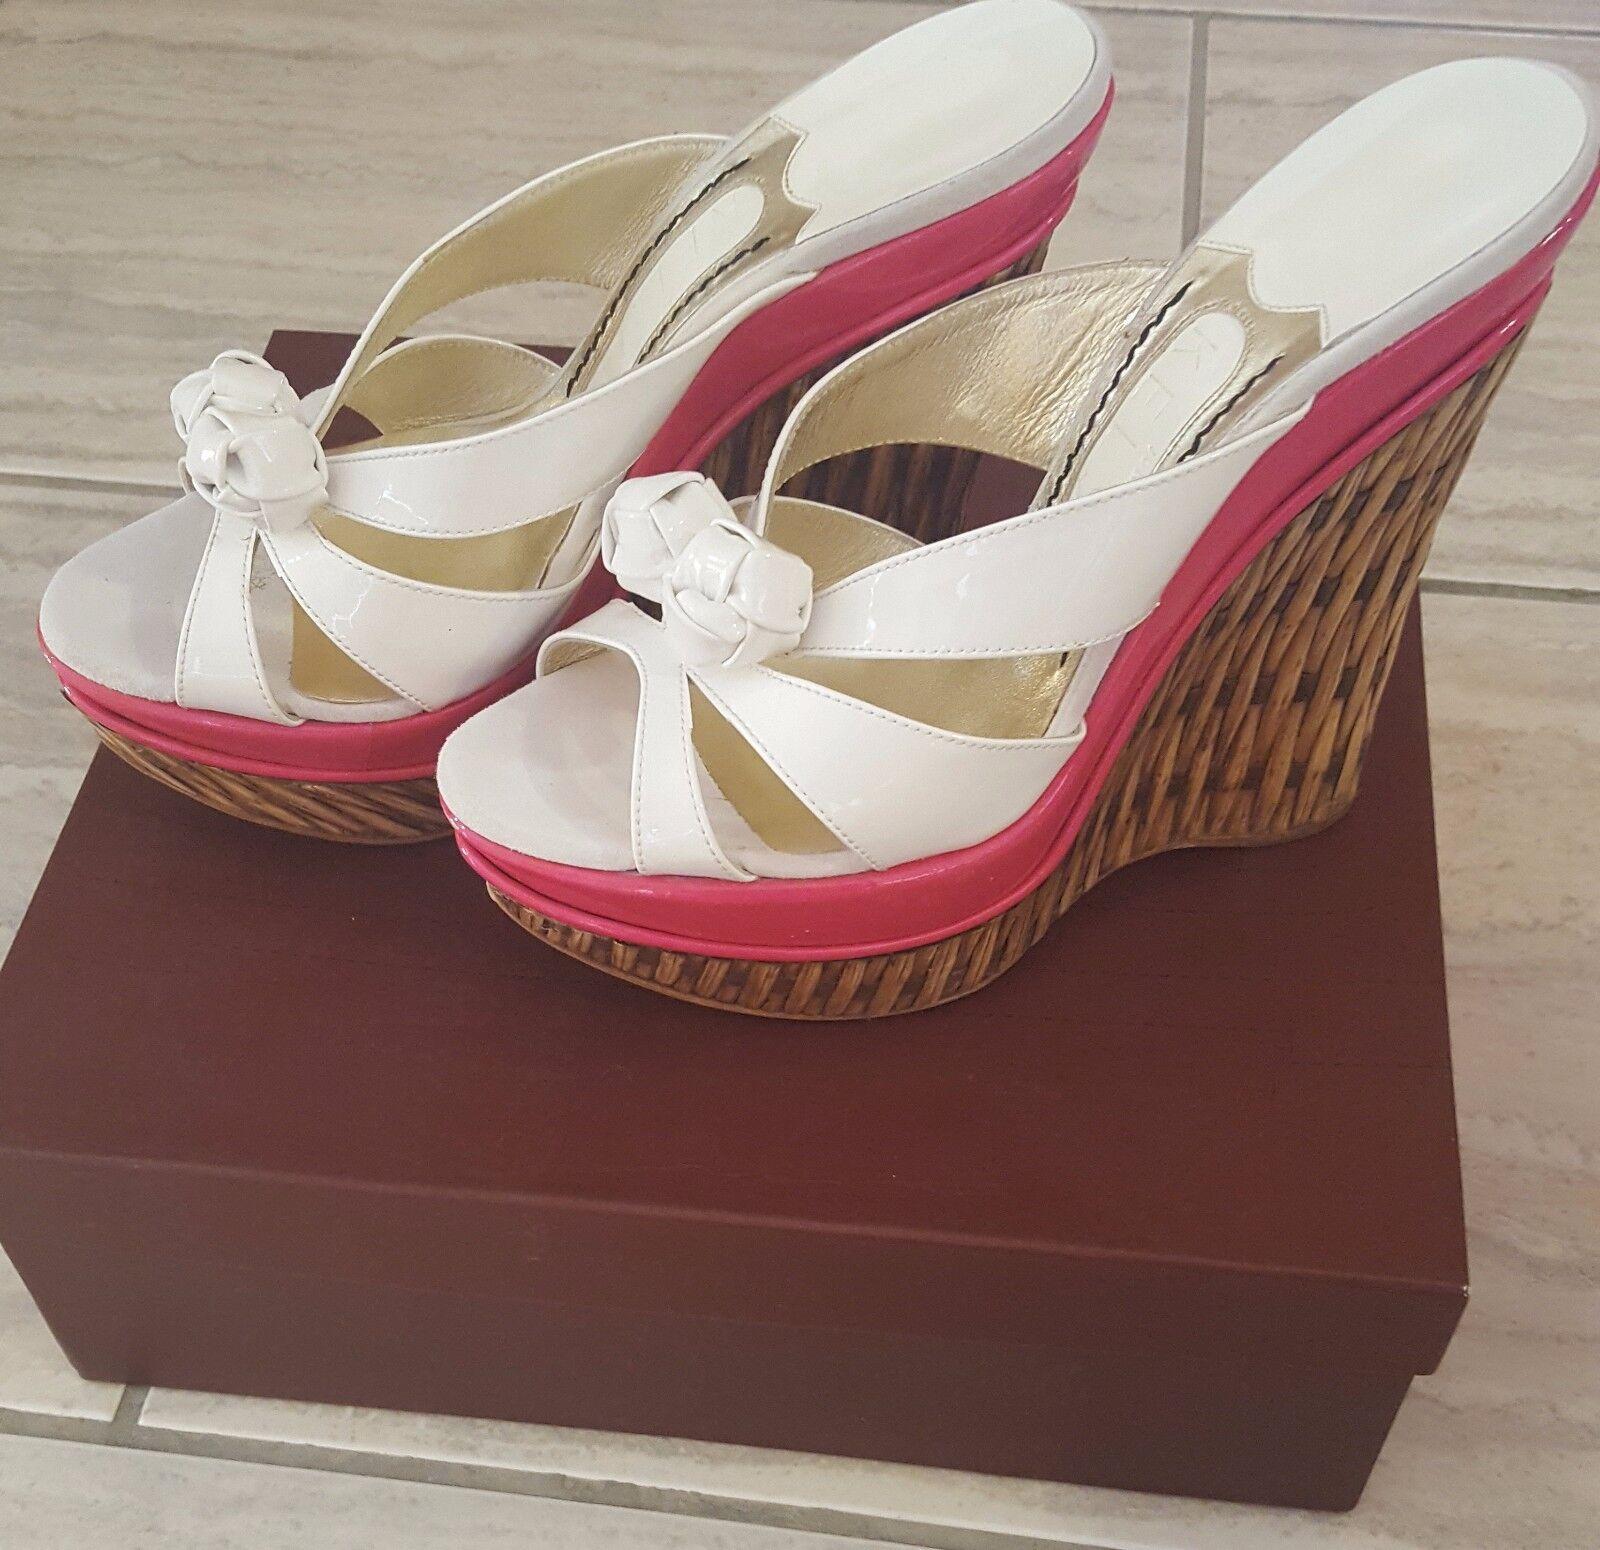 Authentic Designer JONATHAN KELSEY leather Wedges Platform shoes Sz 40 US 9